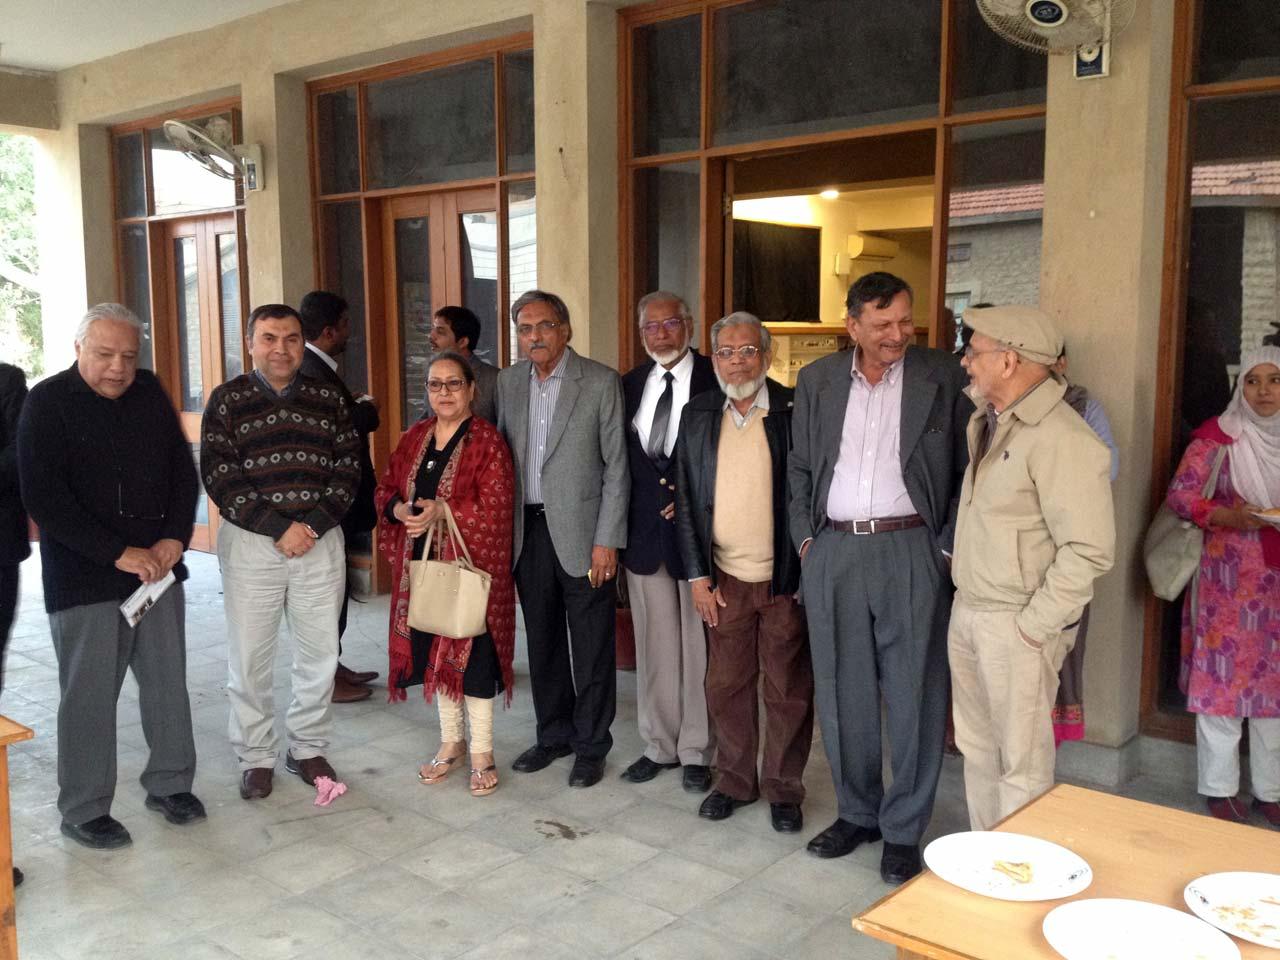 Arif Hasan, Prof. Dr.Noman Ahmad, Mrs. Badar Khan, Engr. Badar Khan, Engr. Col(R) Javed Majid, Engr. Iqbal Ahmed Khan, Engr. Syed Javed Nasir and a guest